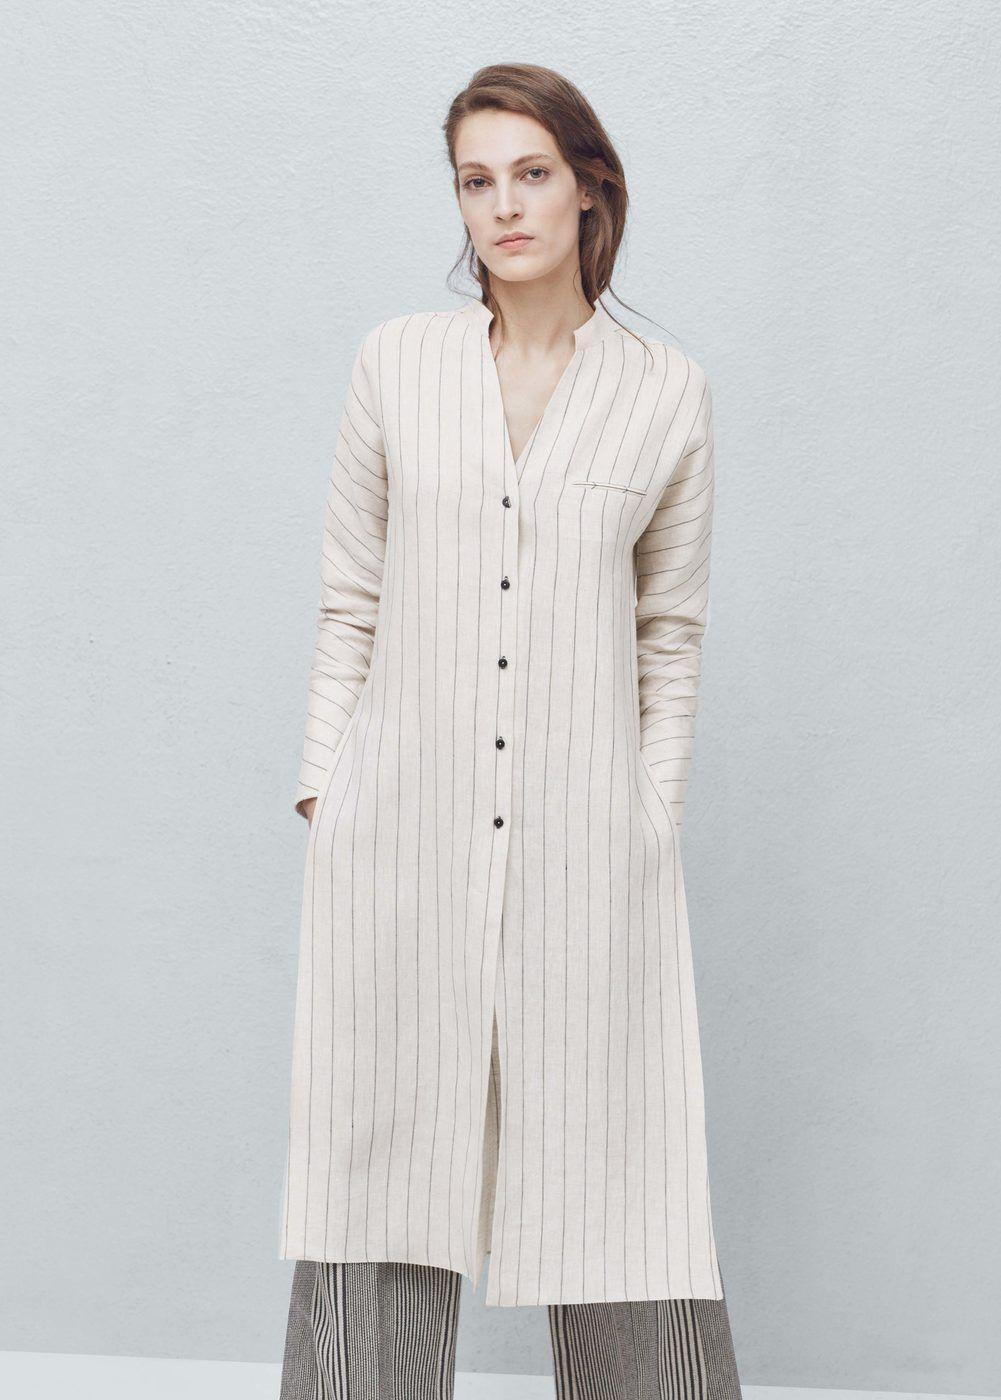 61f4157fdf9d6 Premium - blusón lino rayas - Mujer en 2019 | blusas | Blusones ...